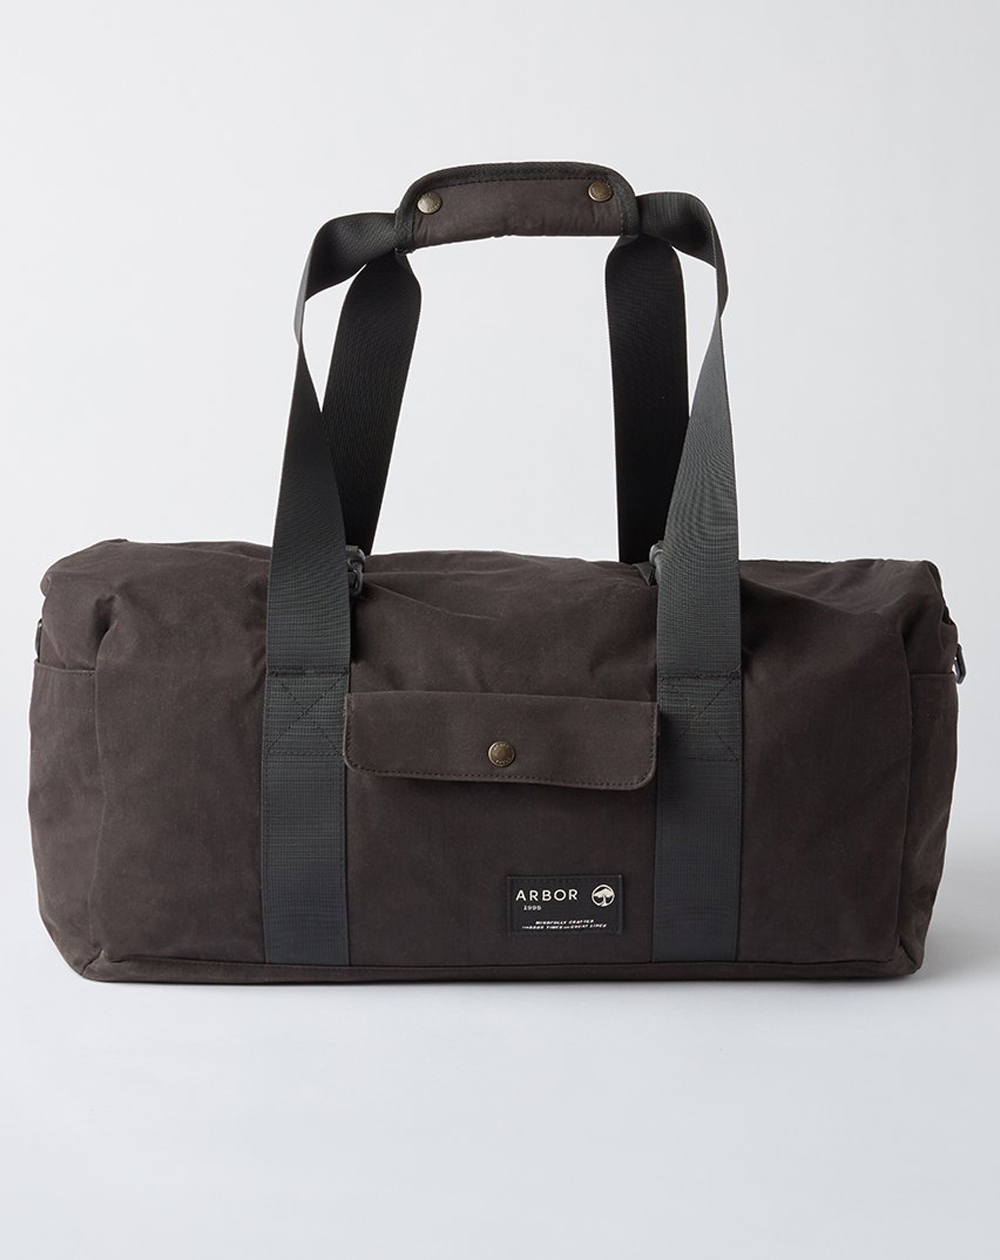 Arbor Up Cargo Duffel-Tasche Vintage Black